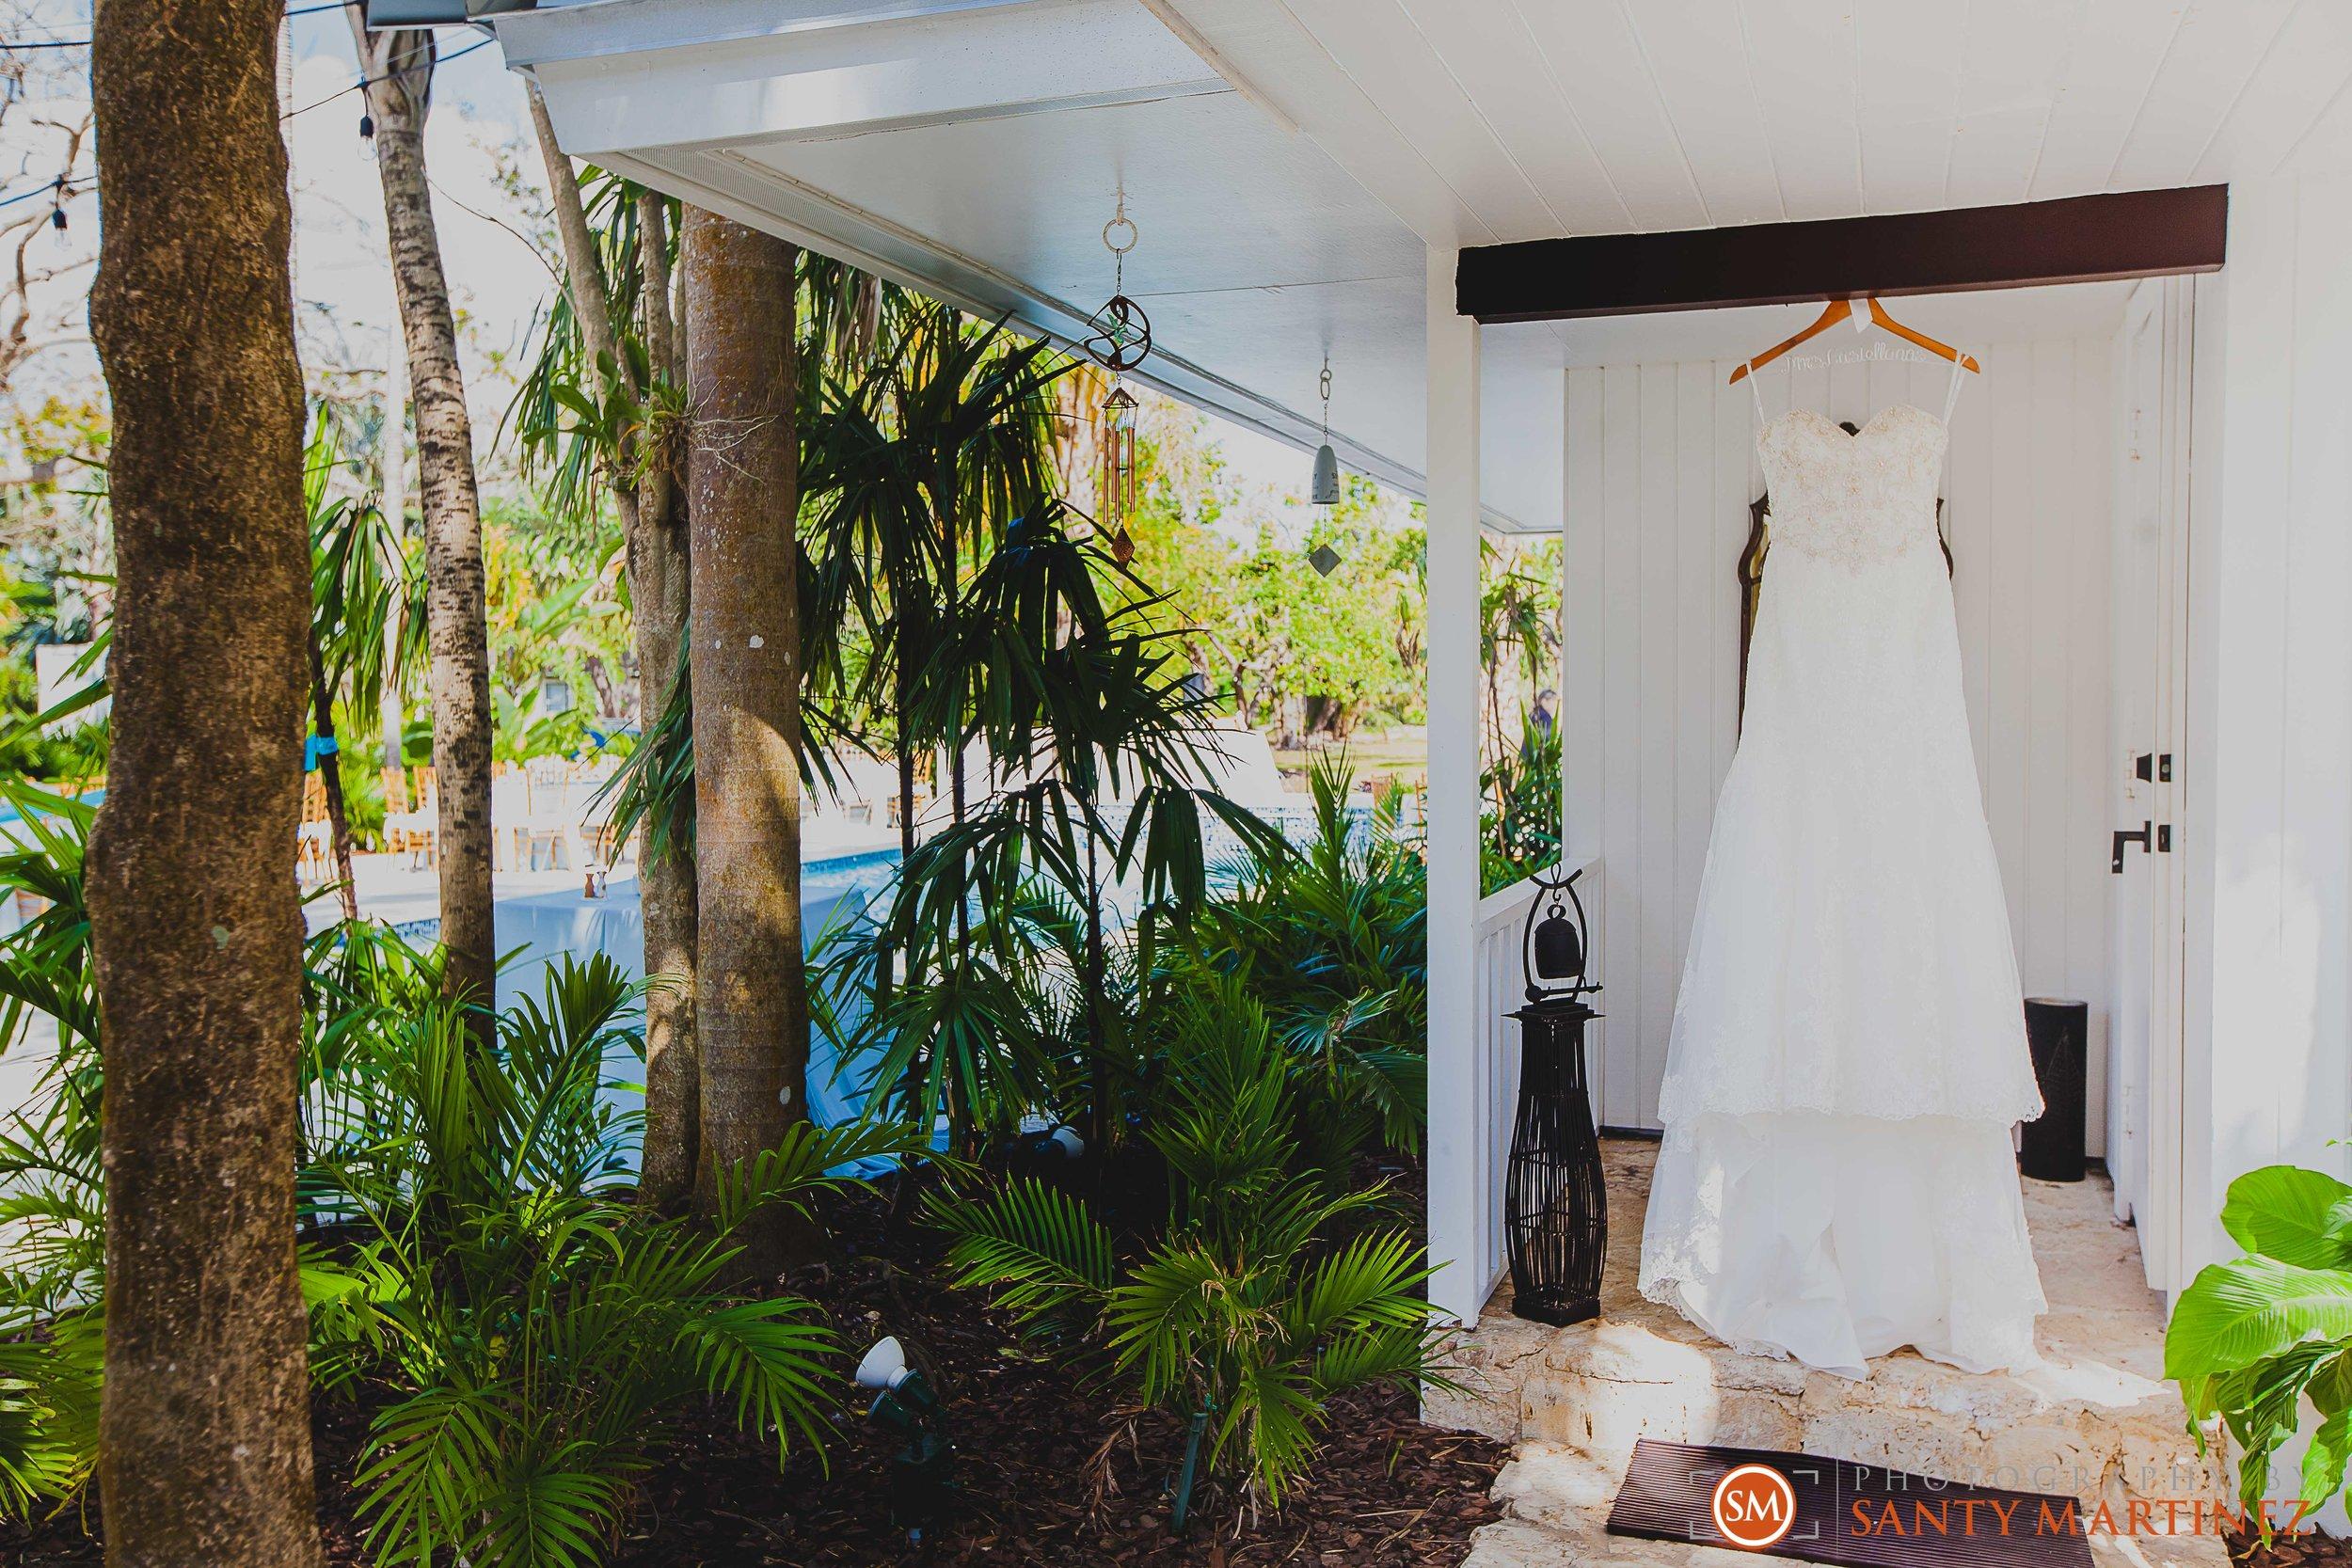 Wedding - Whimsical key West House - Photography by Santy Martinez-5.jpg